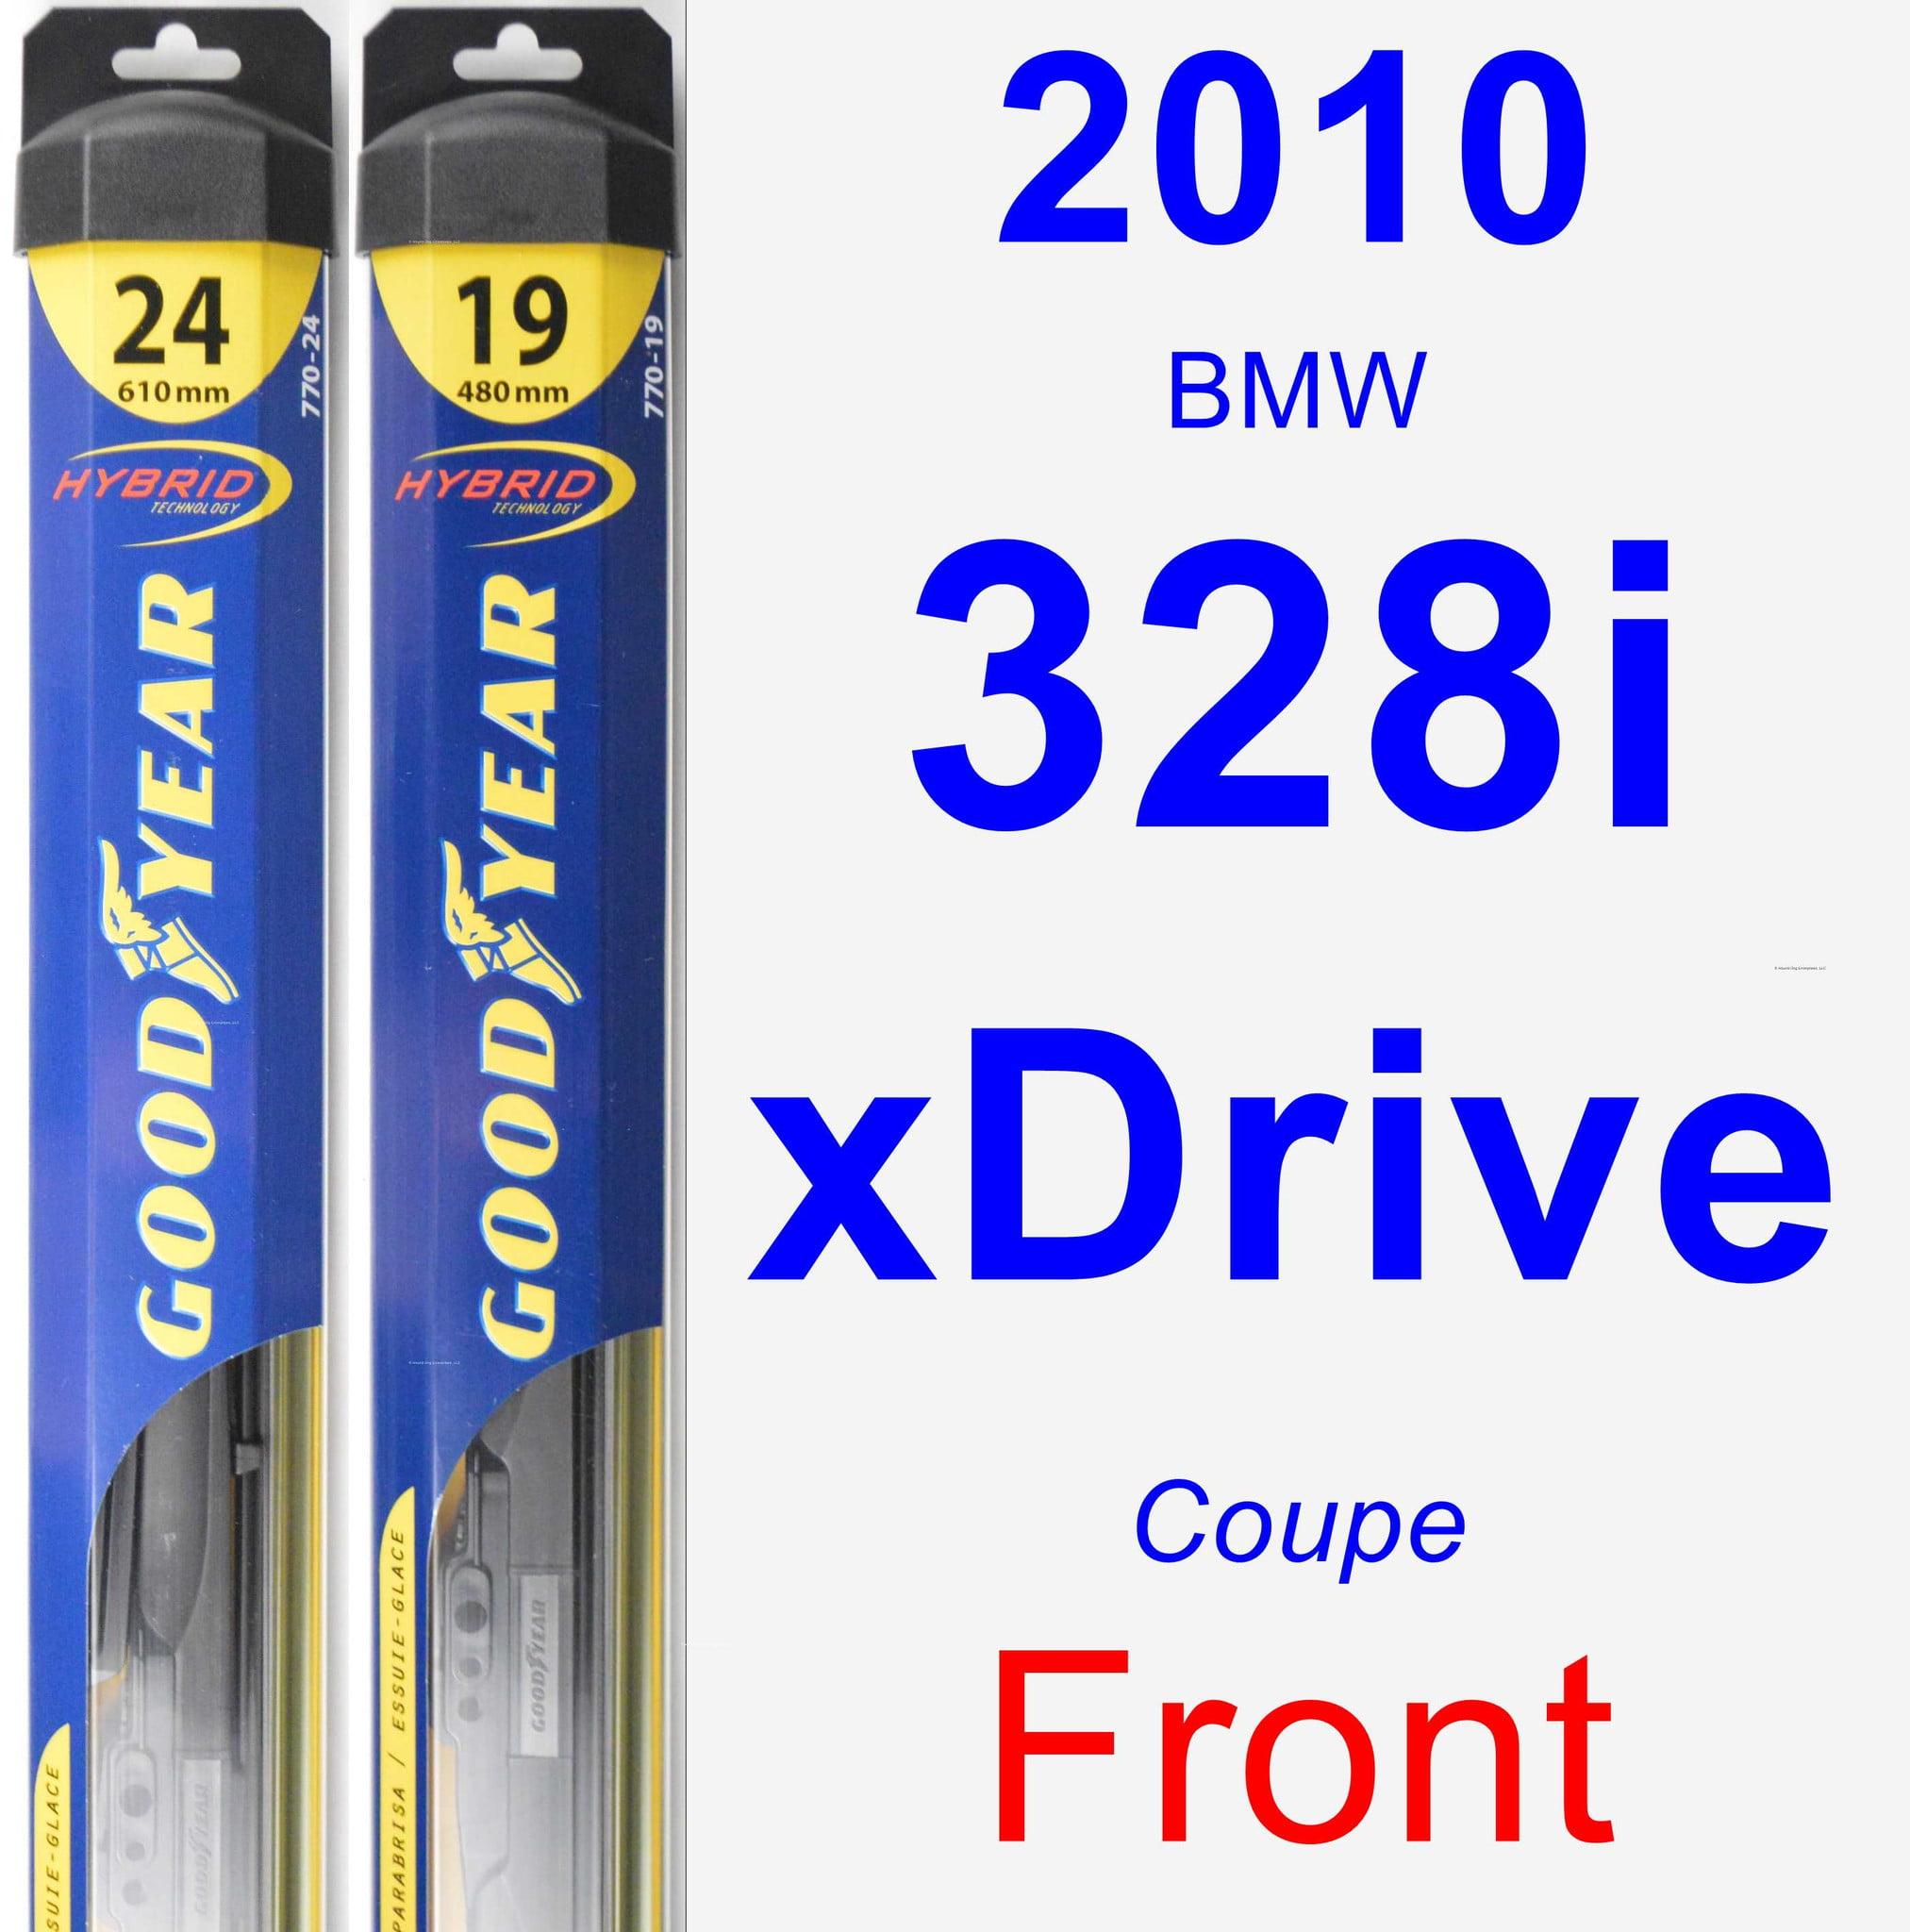 2010 BMW 328i xDrive Passenger Wiper Blade - Hybrid